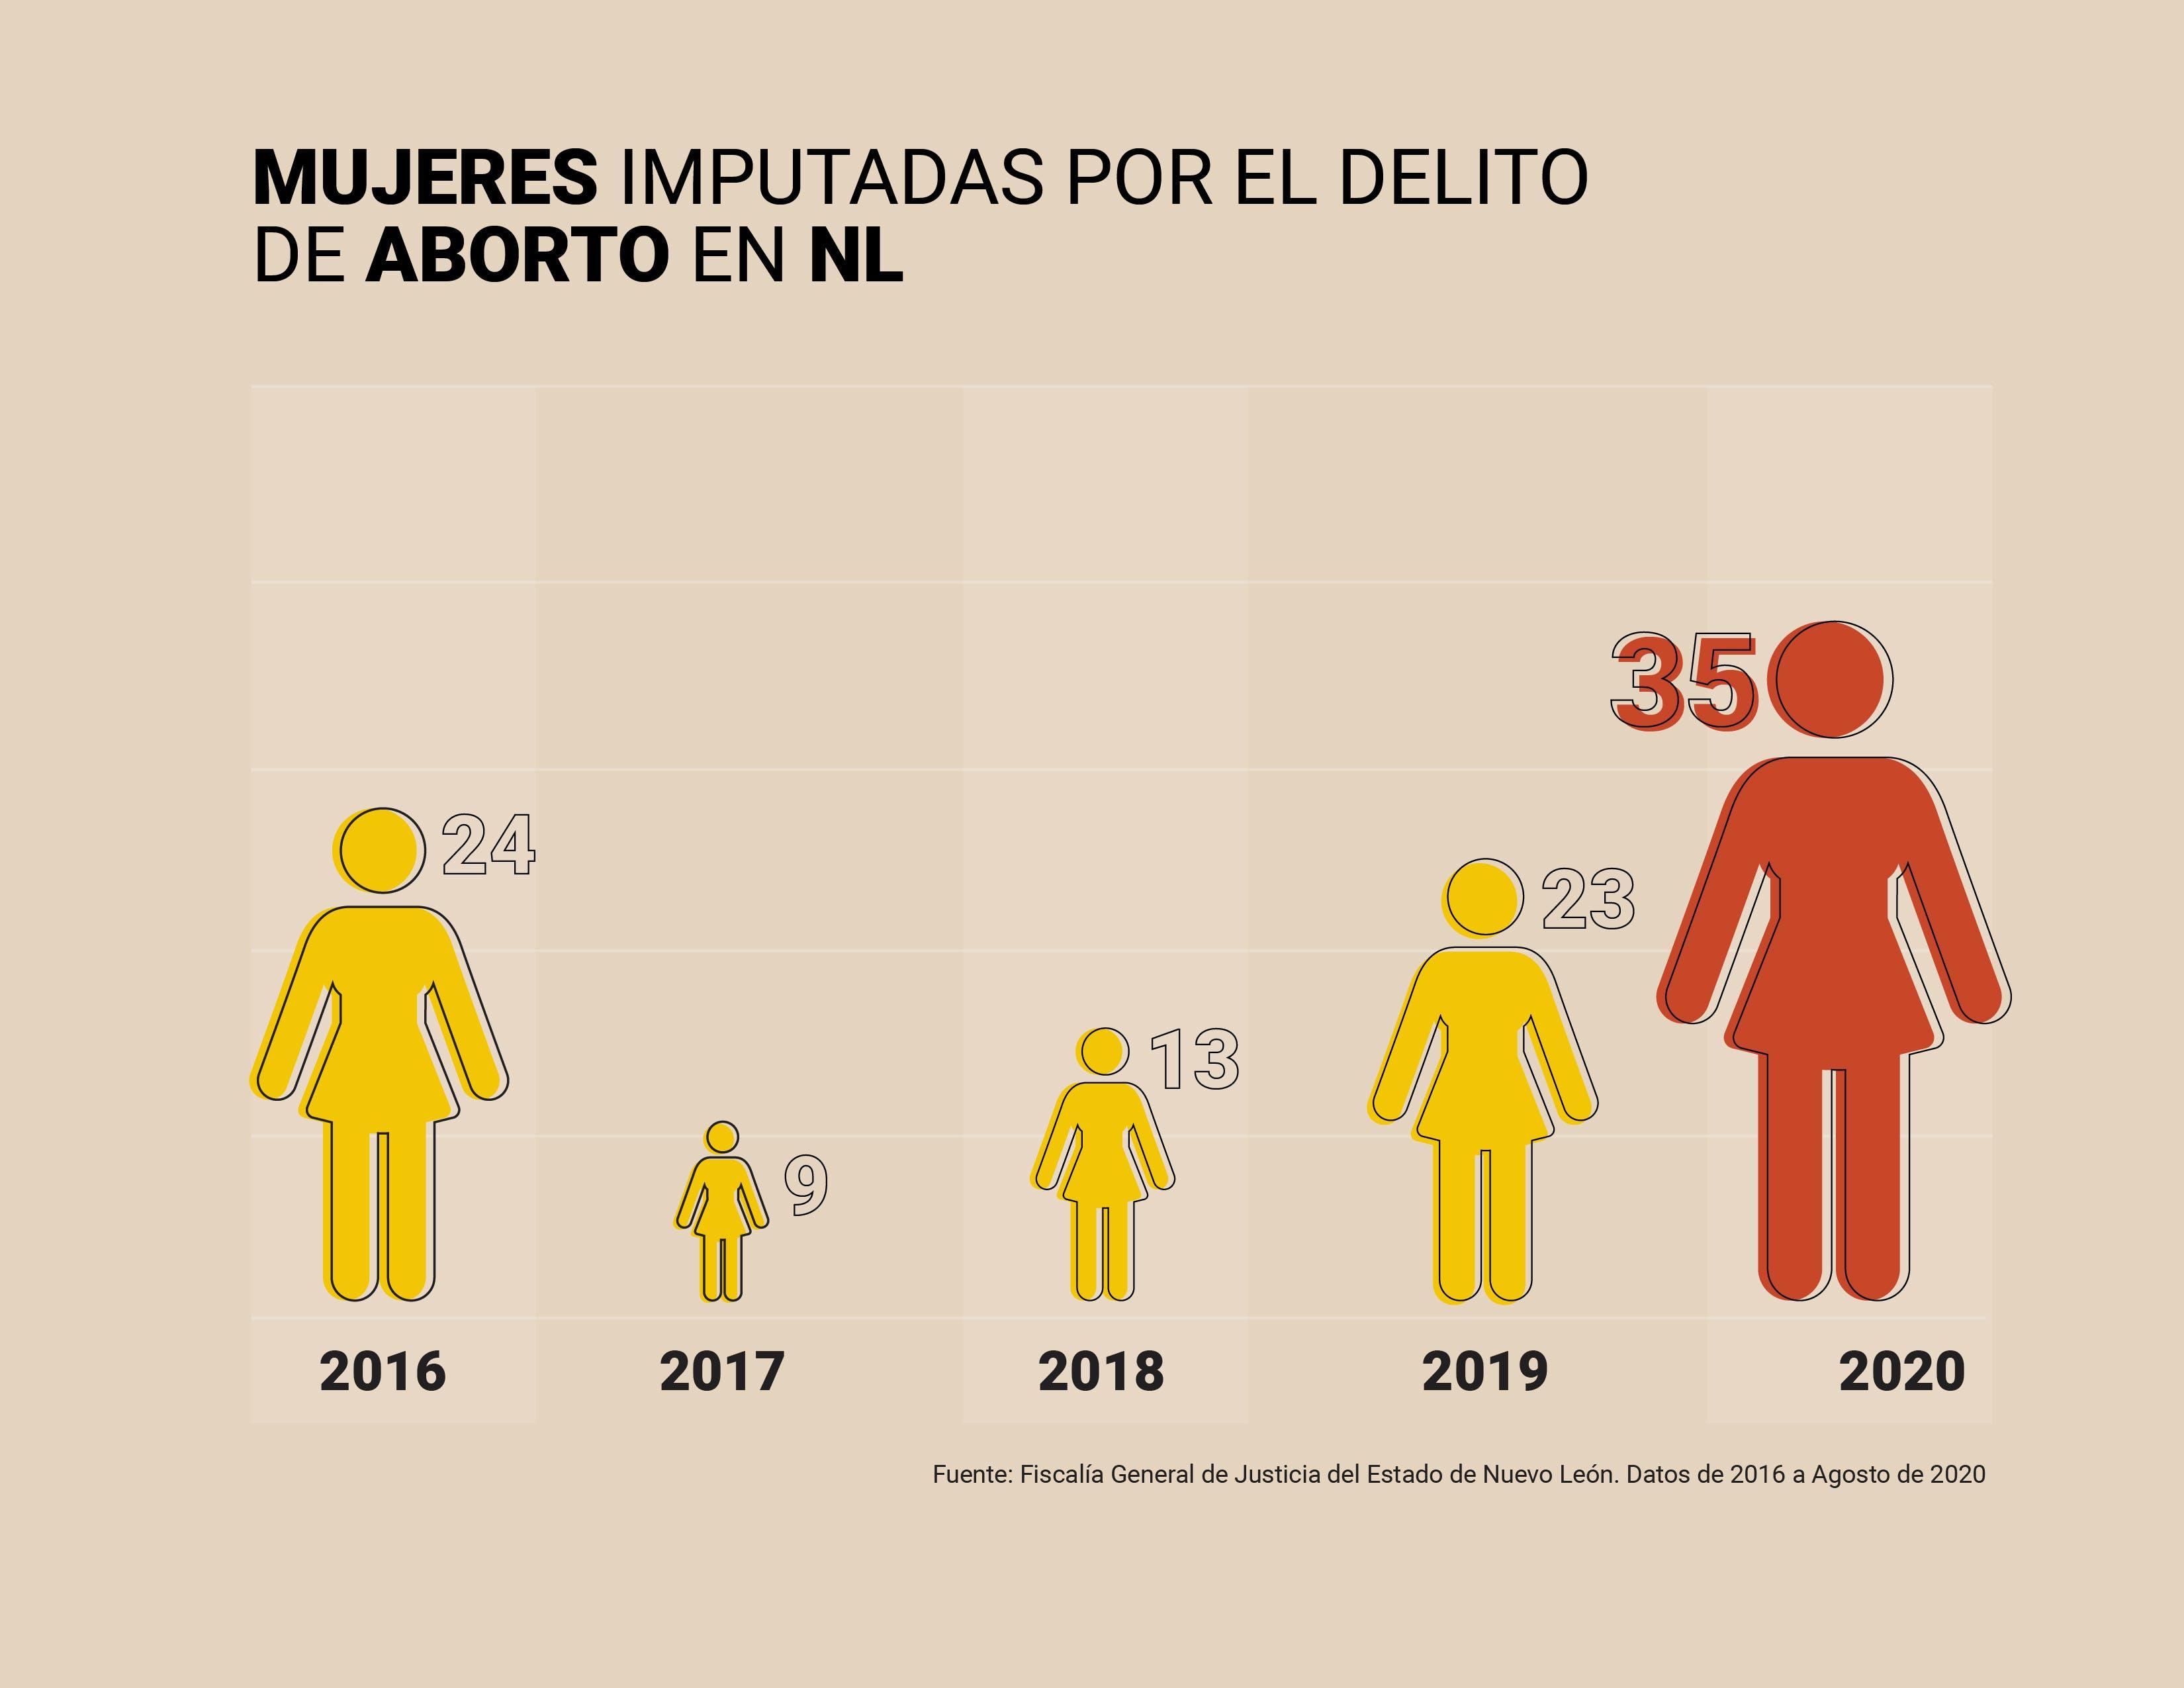 Mujeres, aborto, Nuevo León, feminismo, género, abuso, criminalización, acoso